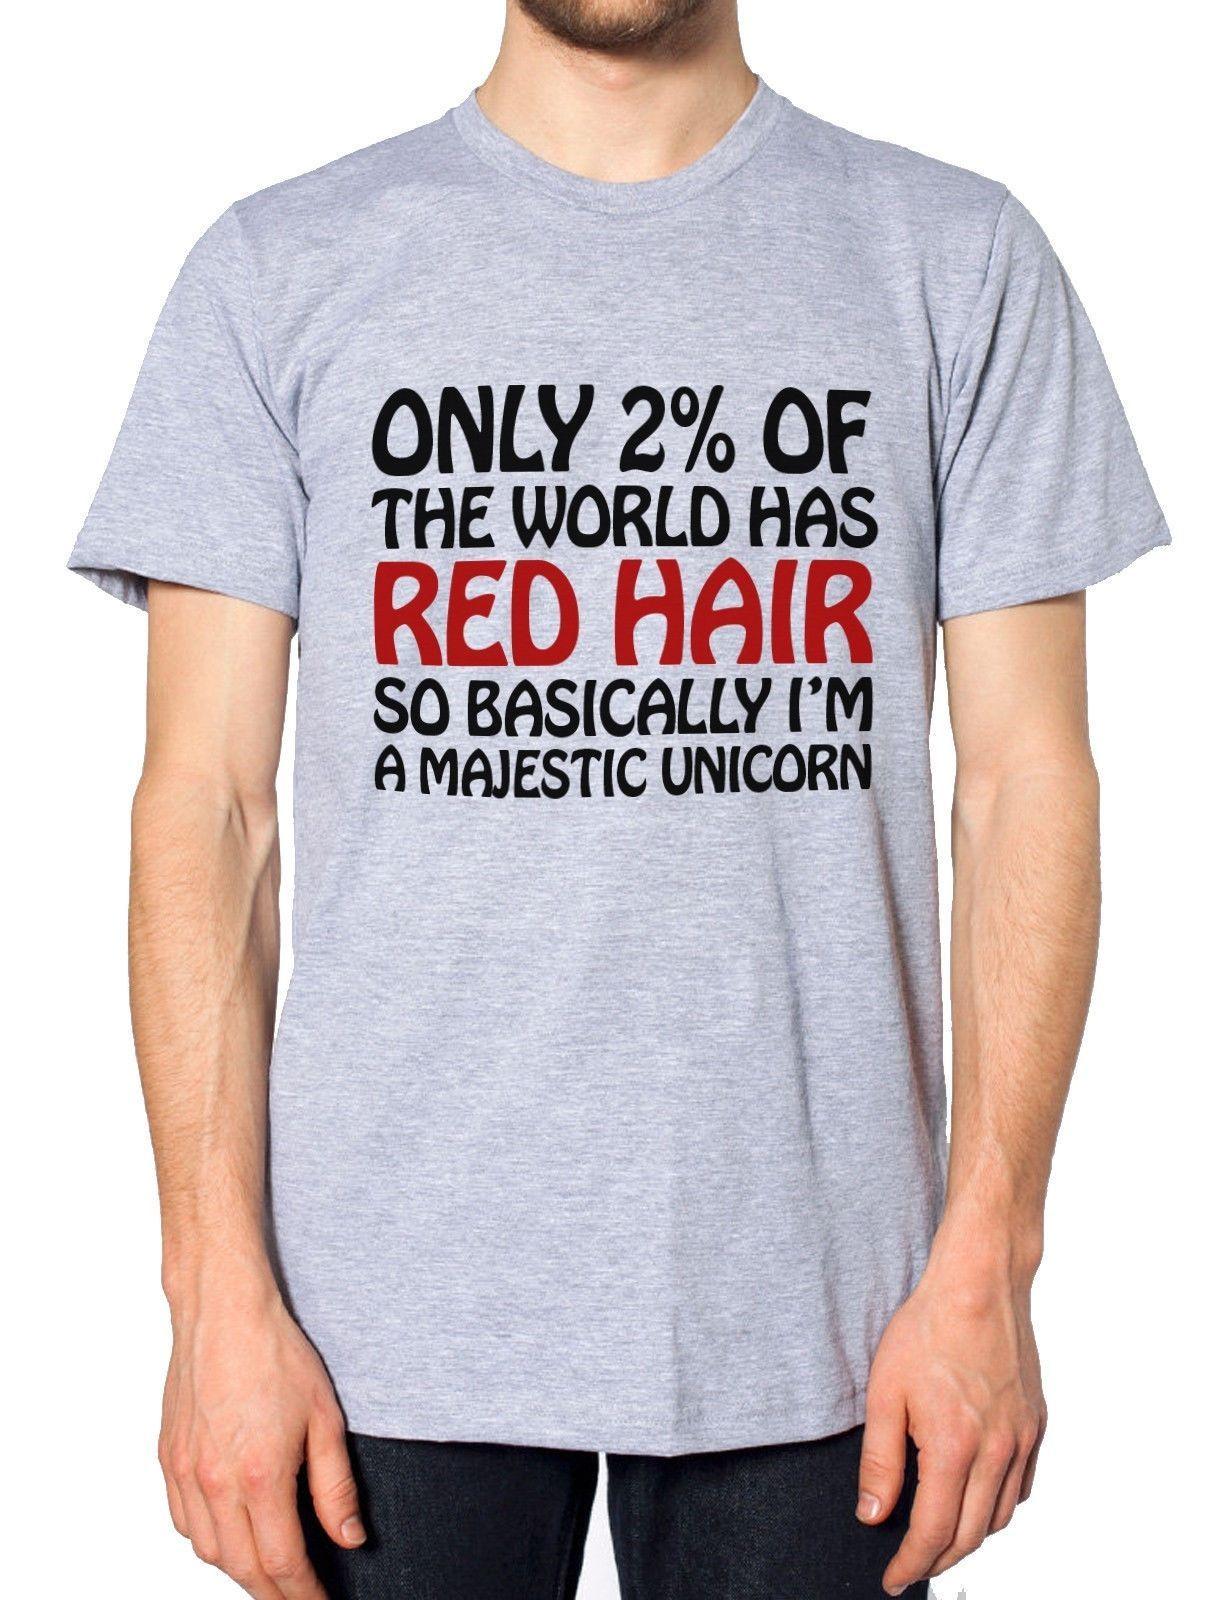 f147b6d7acde Only 2% World Red Hair Unicorn Funny Hipster T Shirt Men Women Tshirt  Ginger 2018 Short Sleeve O Neck 100% Cotton Print Mens Summer Cool T Shirts  Design ...